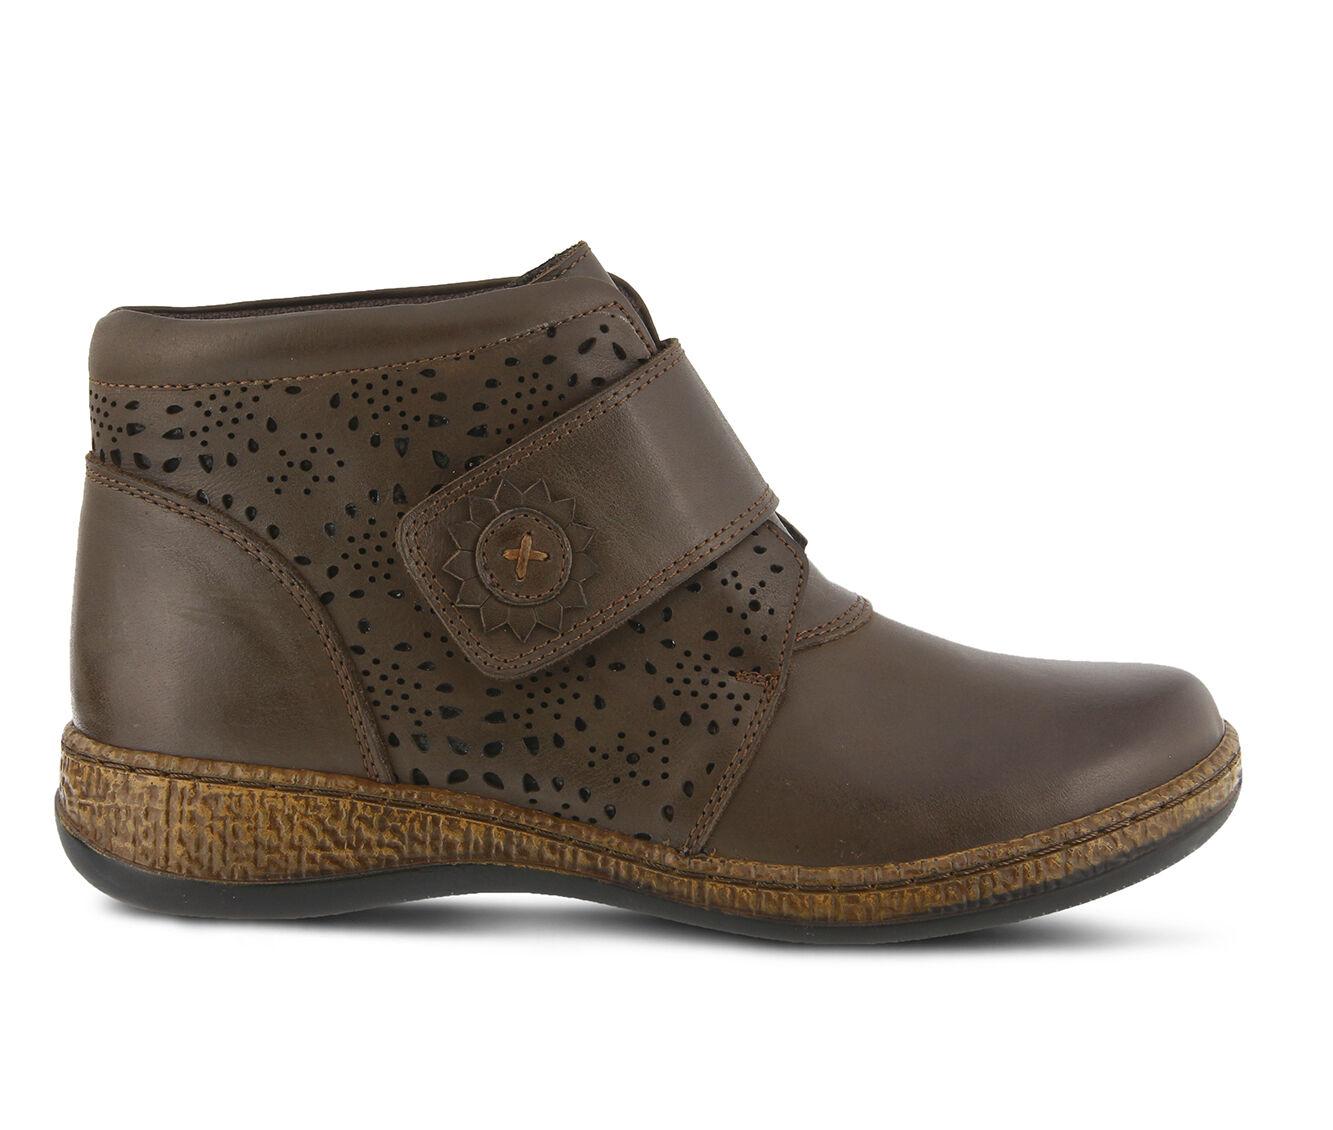 uk shoes_kd5345